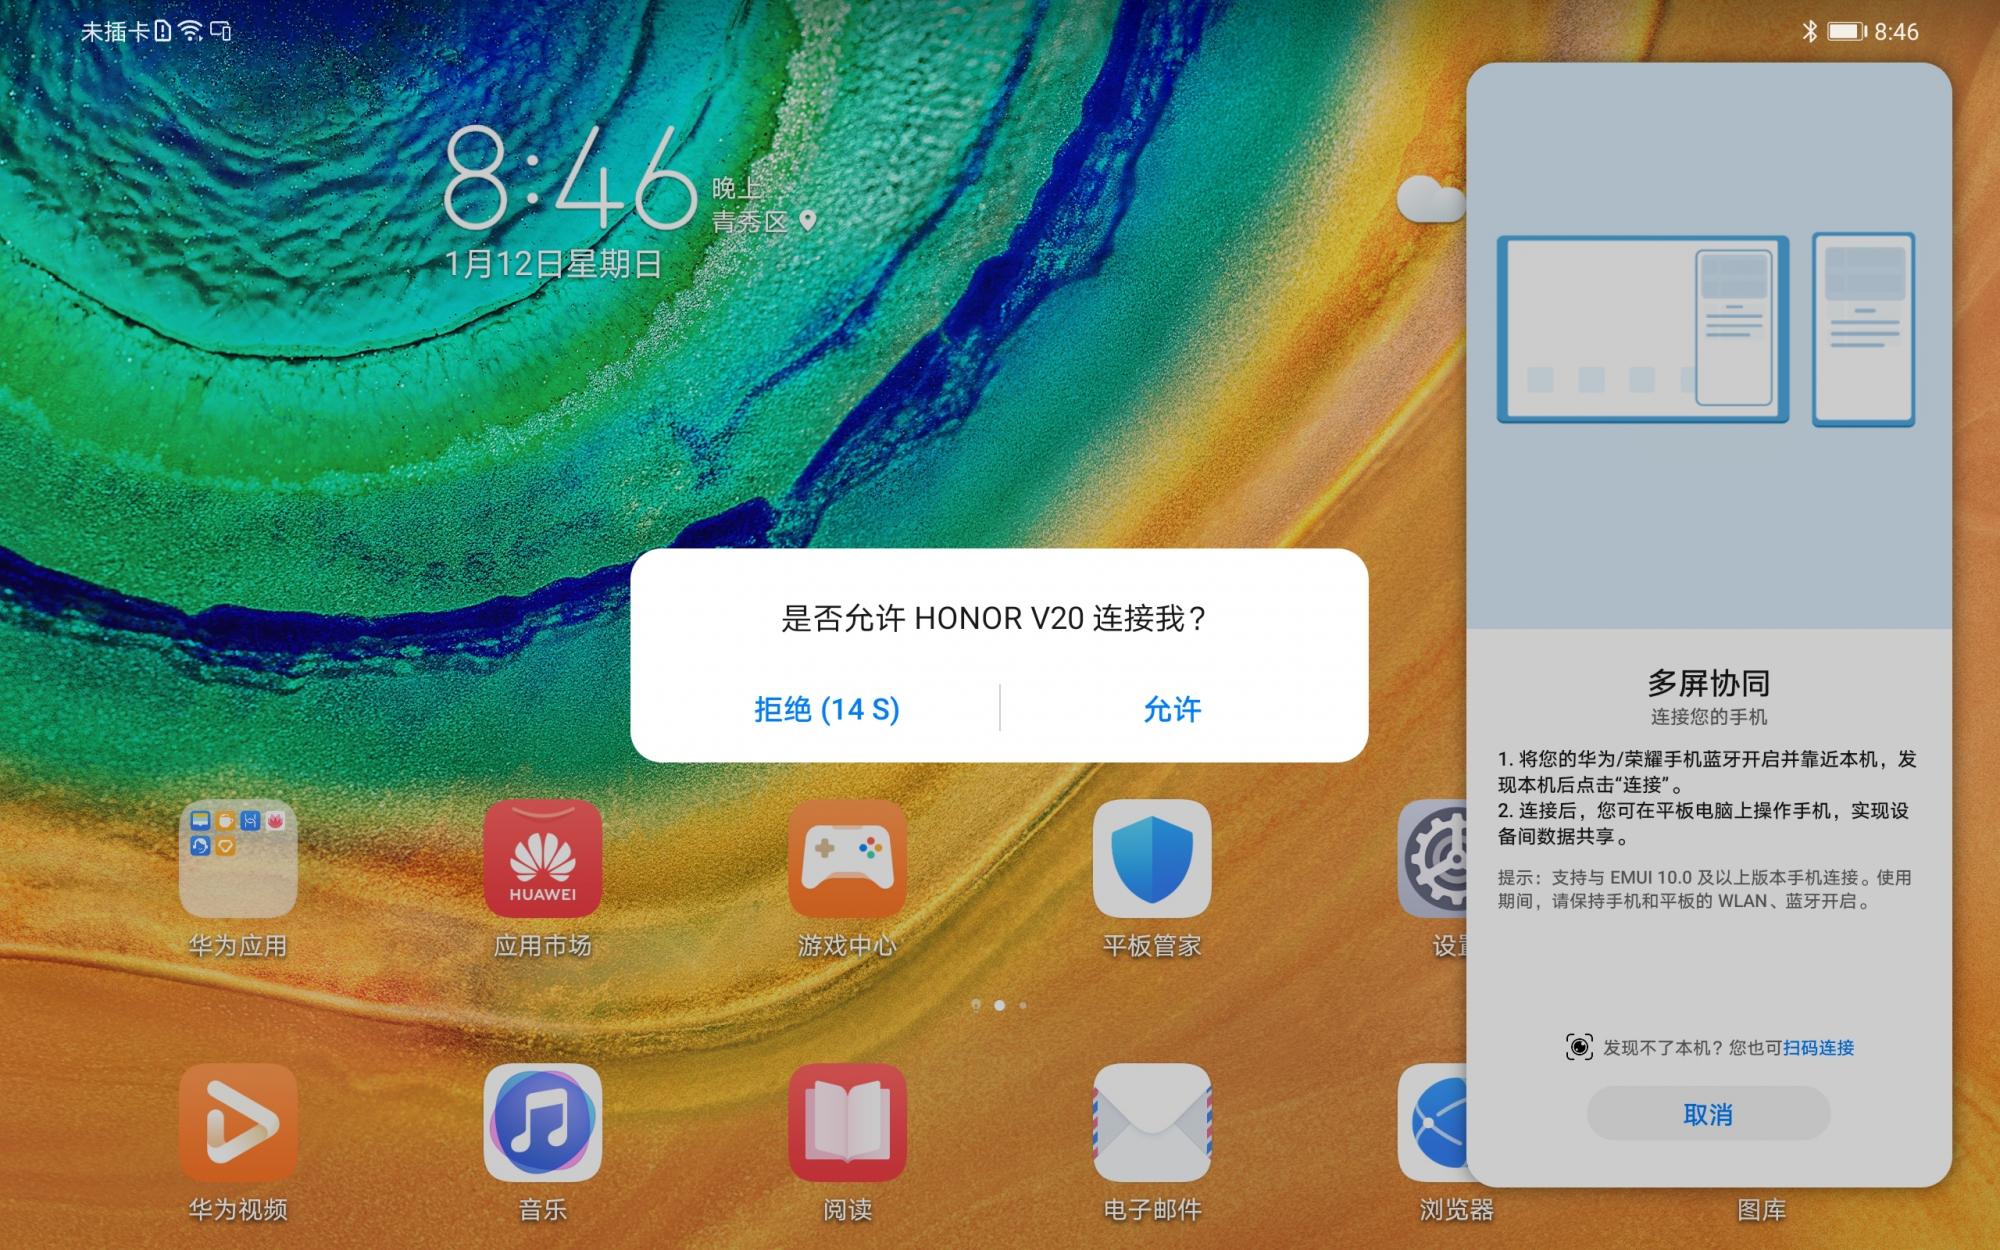 Screenshot_20200112_204618_com.huawei.android.lau.jpg